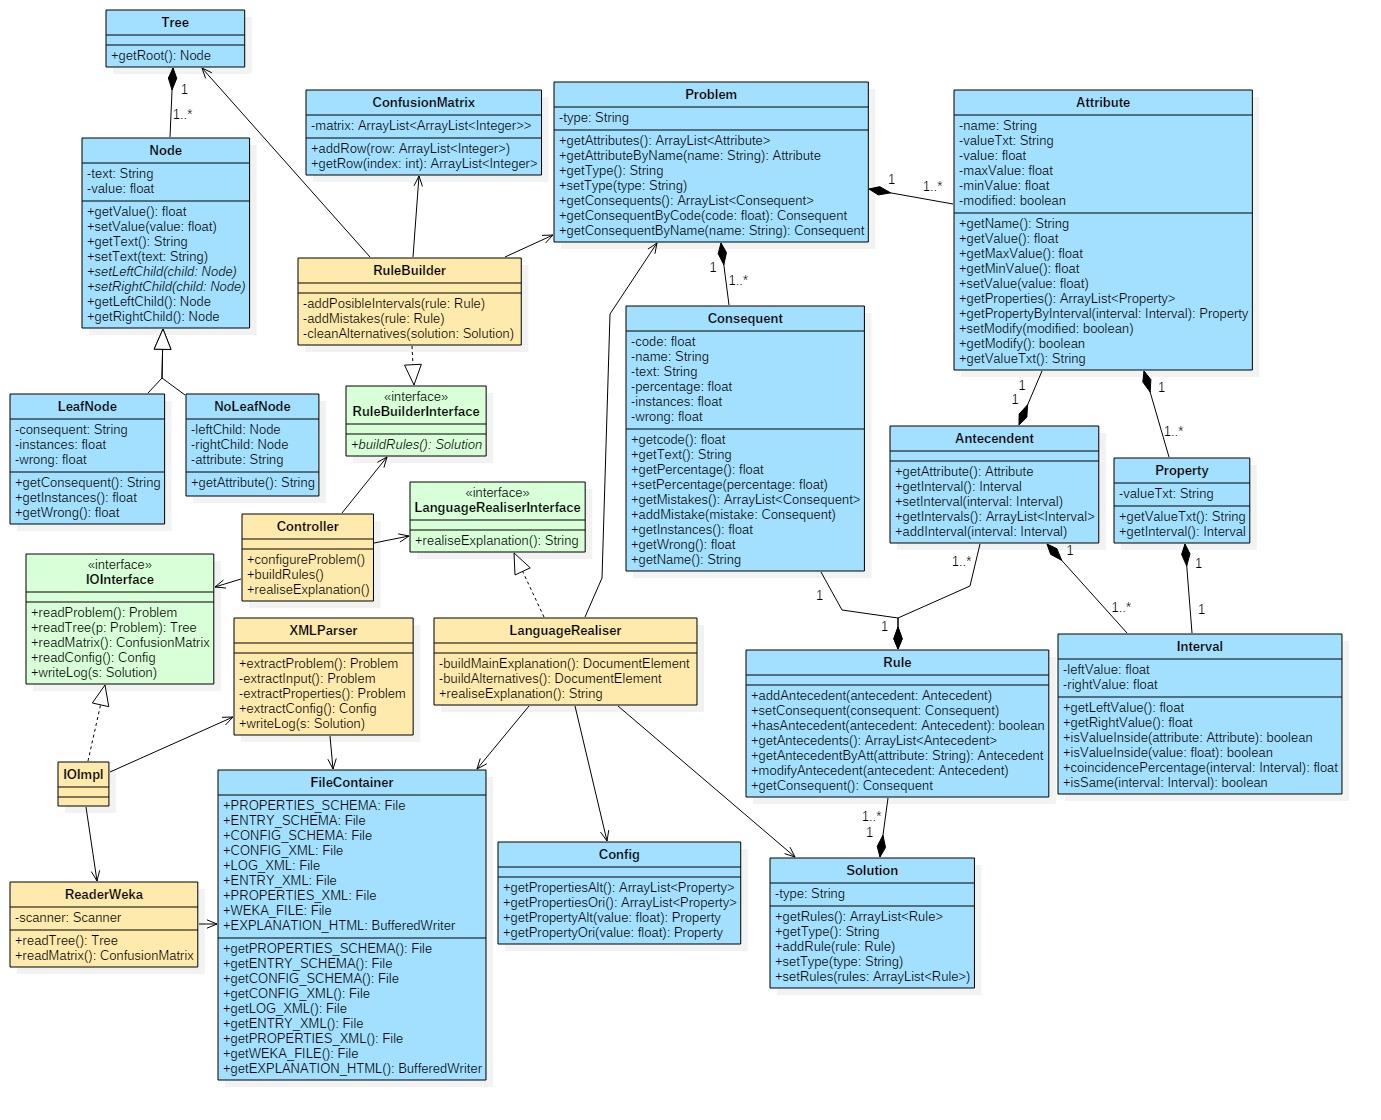 docs/WekaParser/diagramas/ClassDiagram.jpg